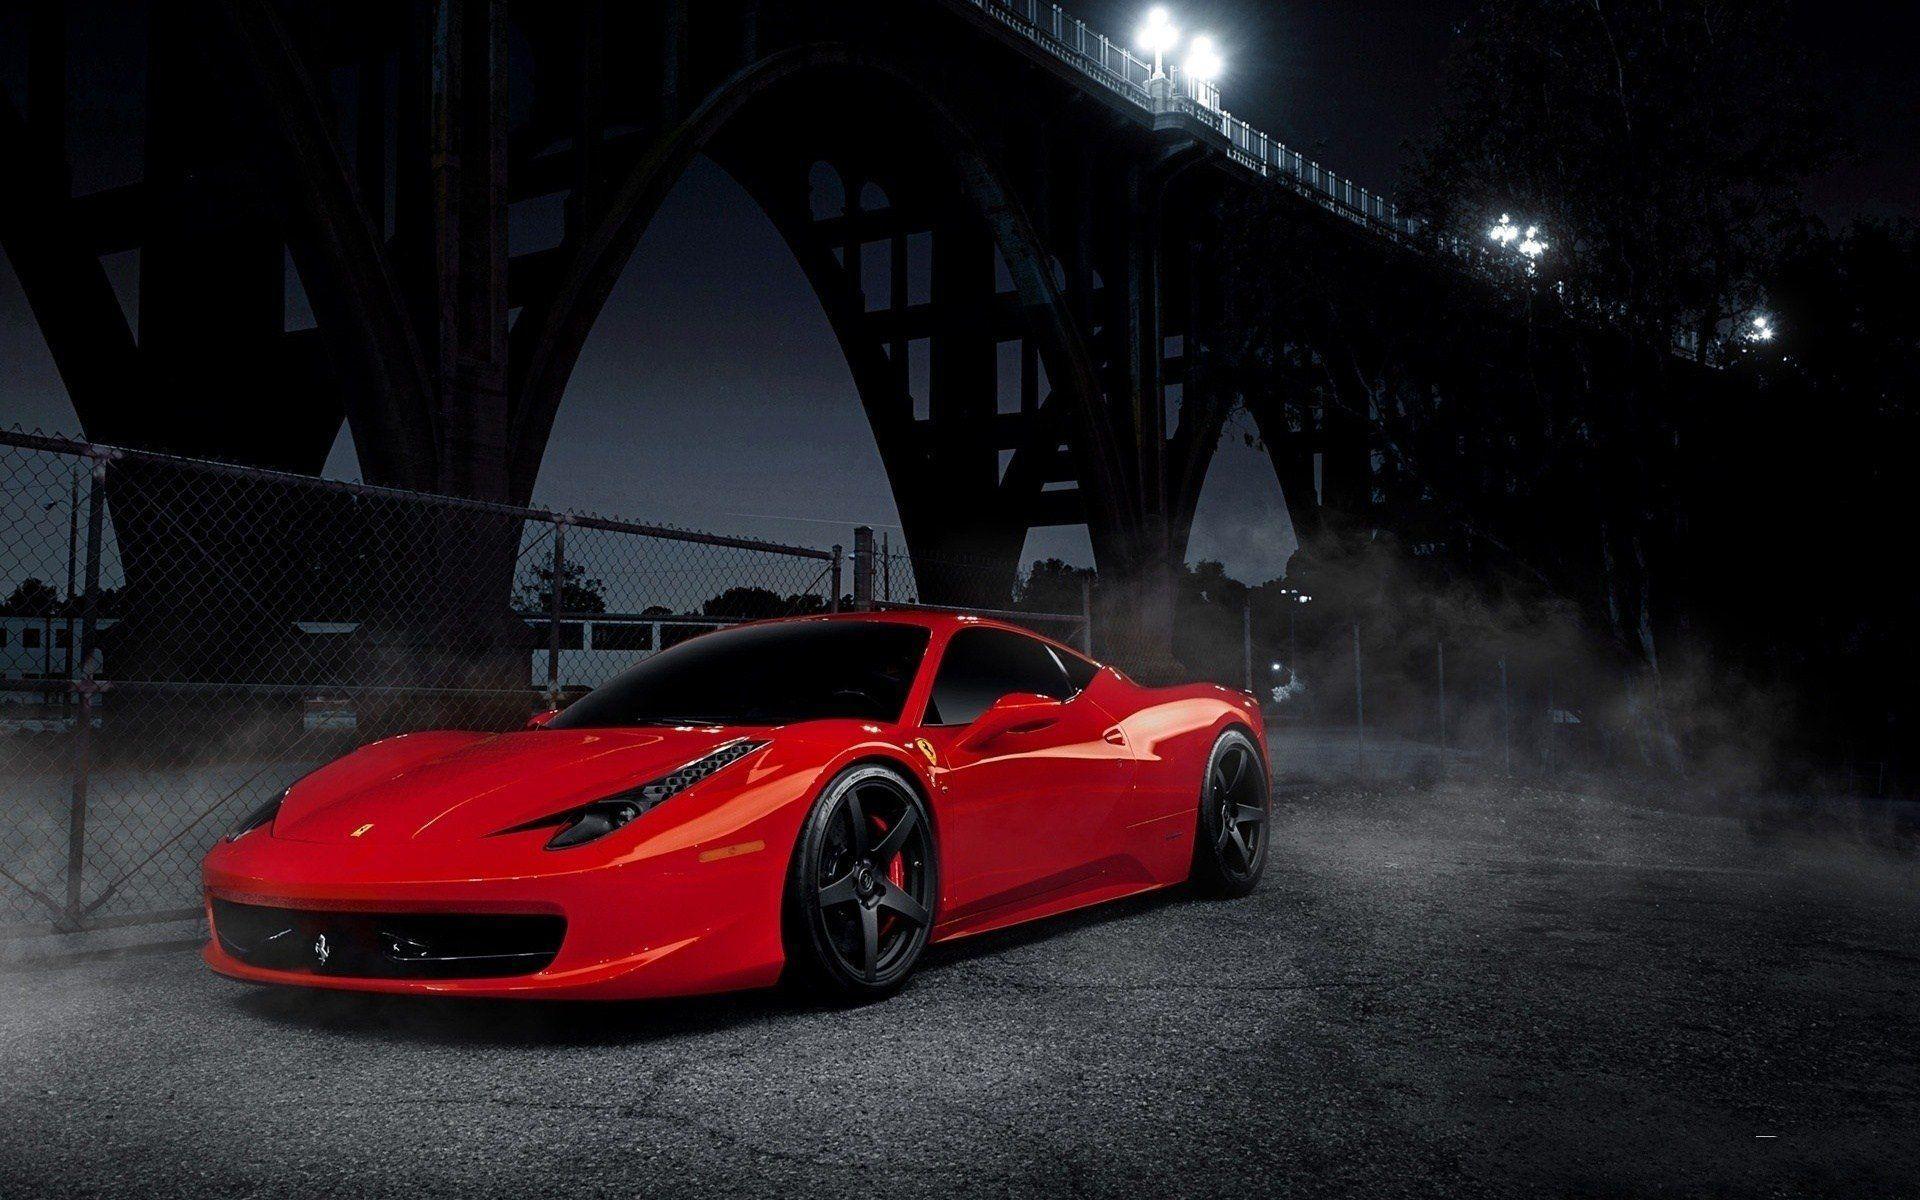 Black Ferrari Wallpaper Hd For Desktop